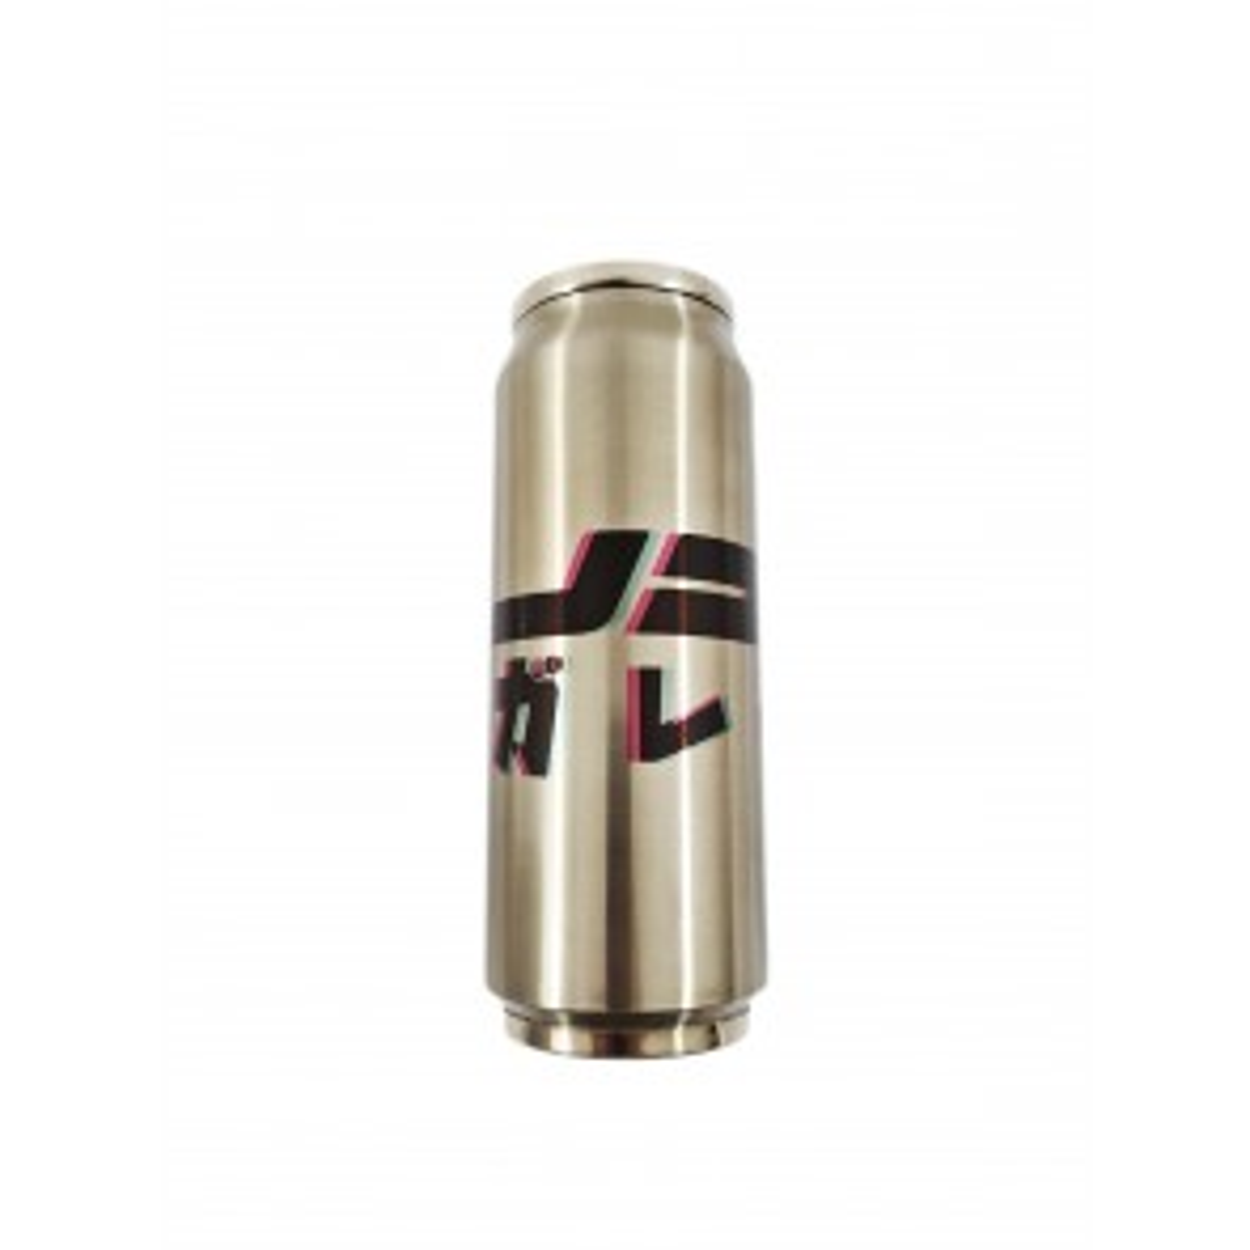 JDMGarageUK Black Blur Stainless Steel Water Bottle Thermos 500ml